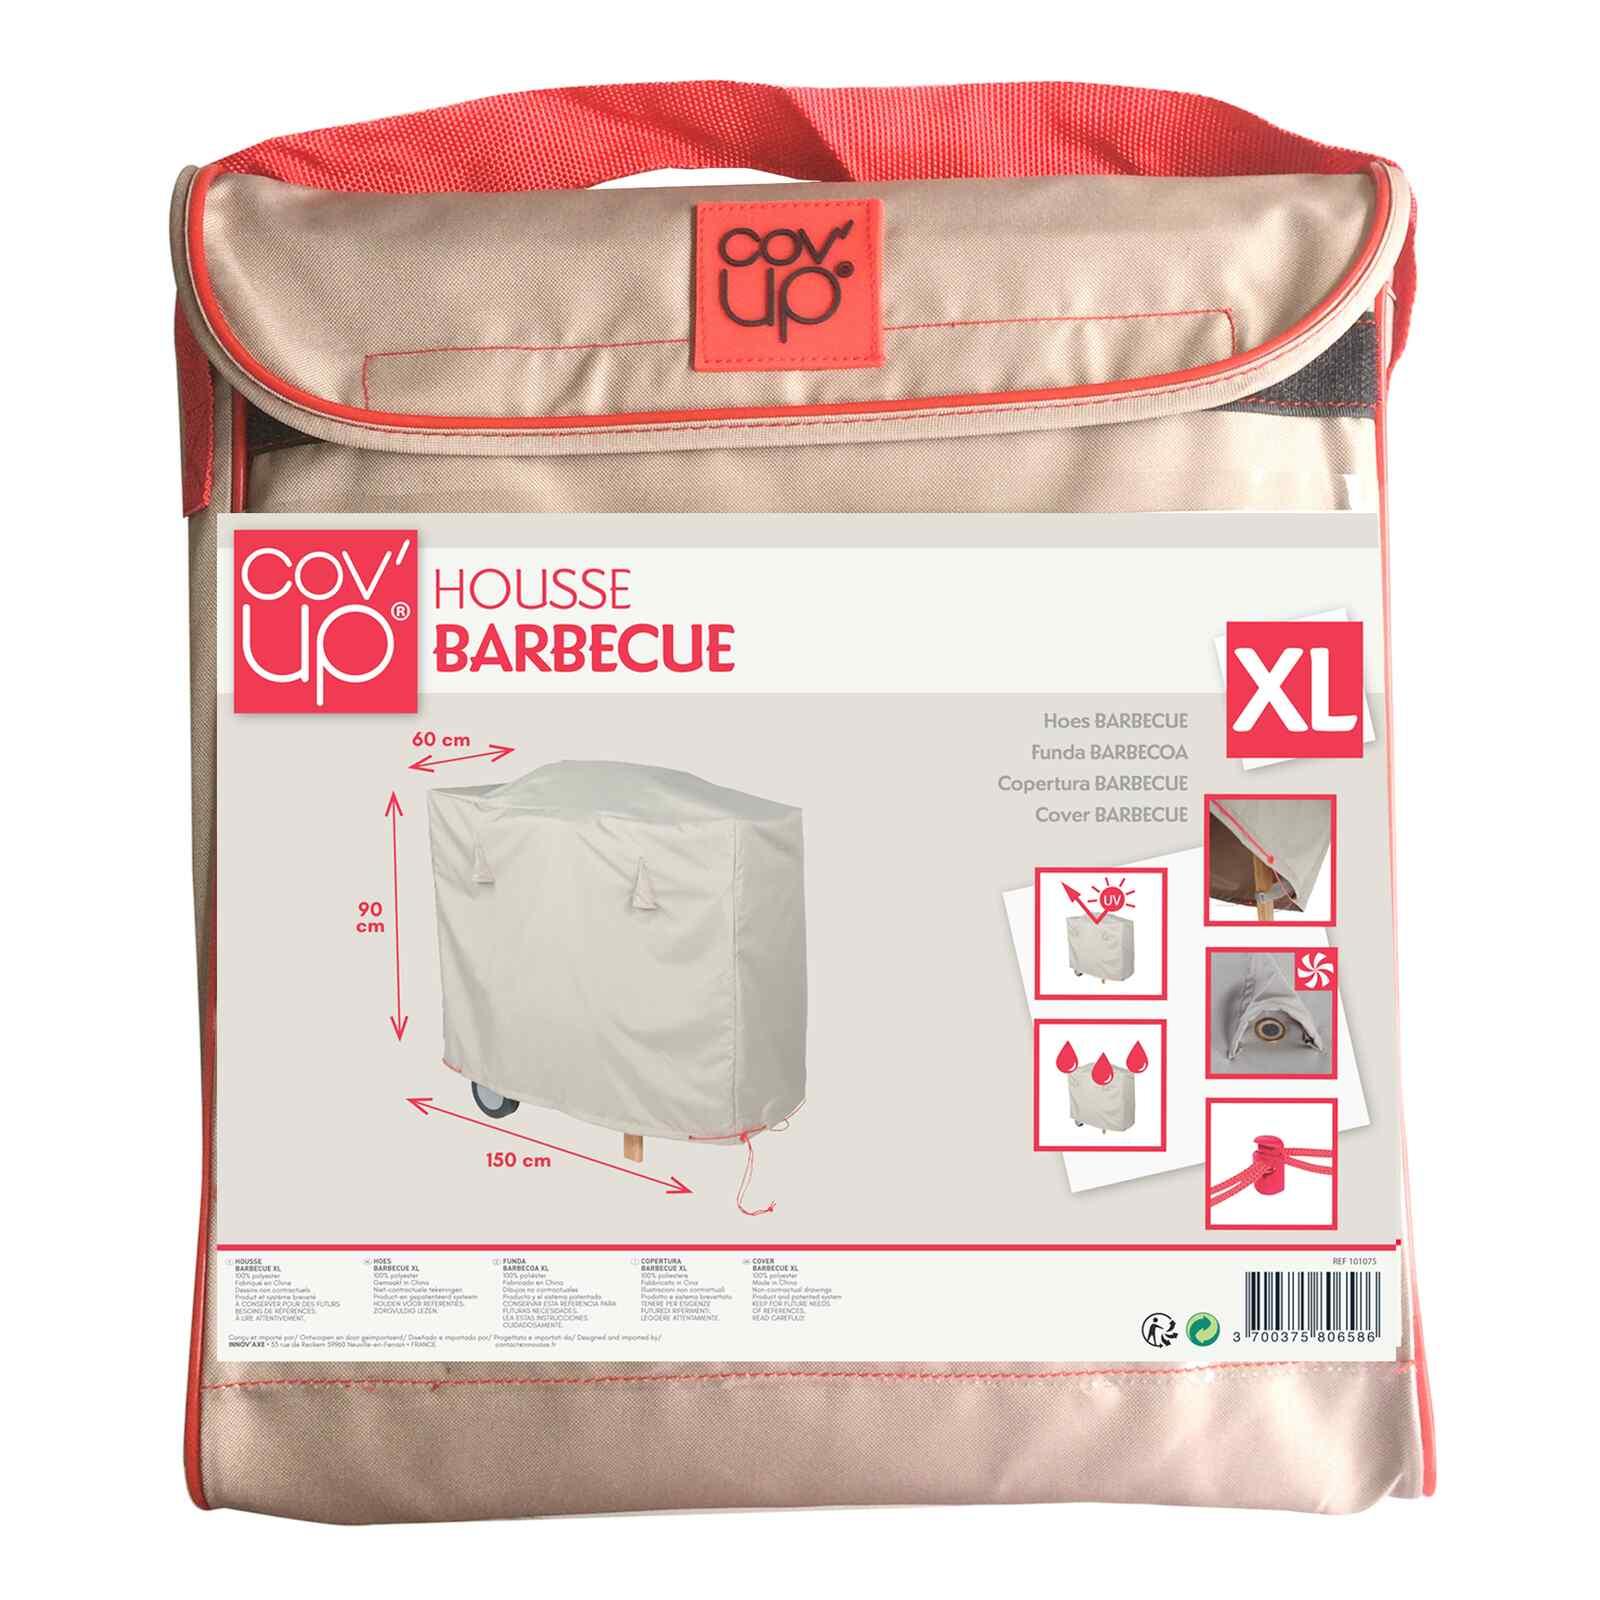 Housse de protection barbecue 150 x 60 cm XXL, Cov'Up